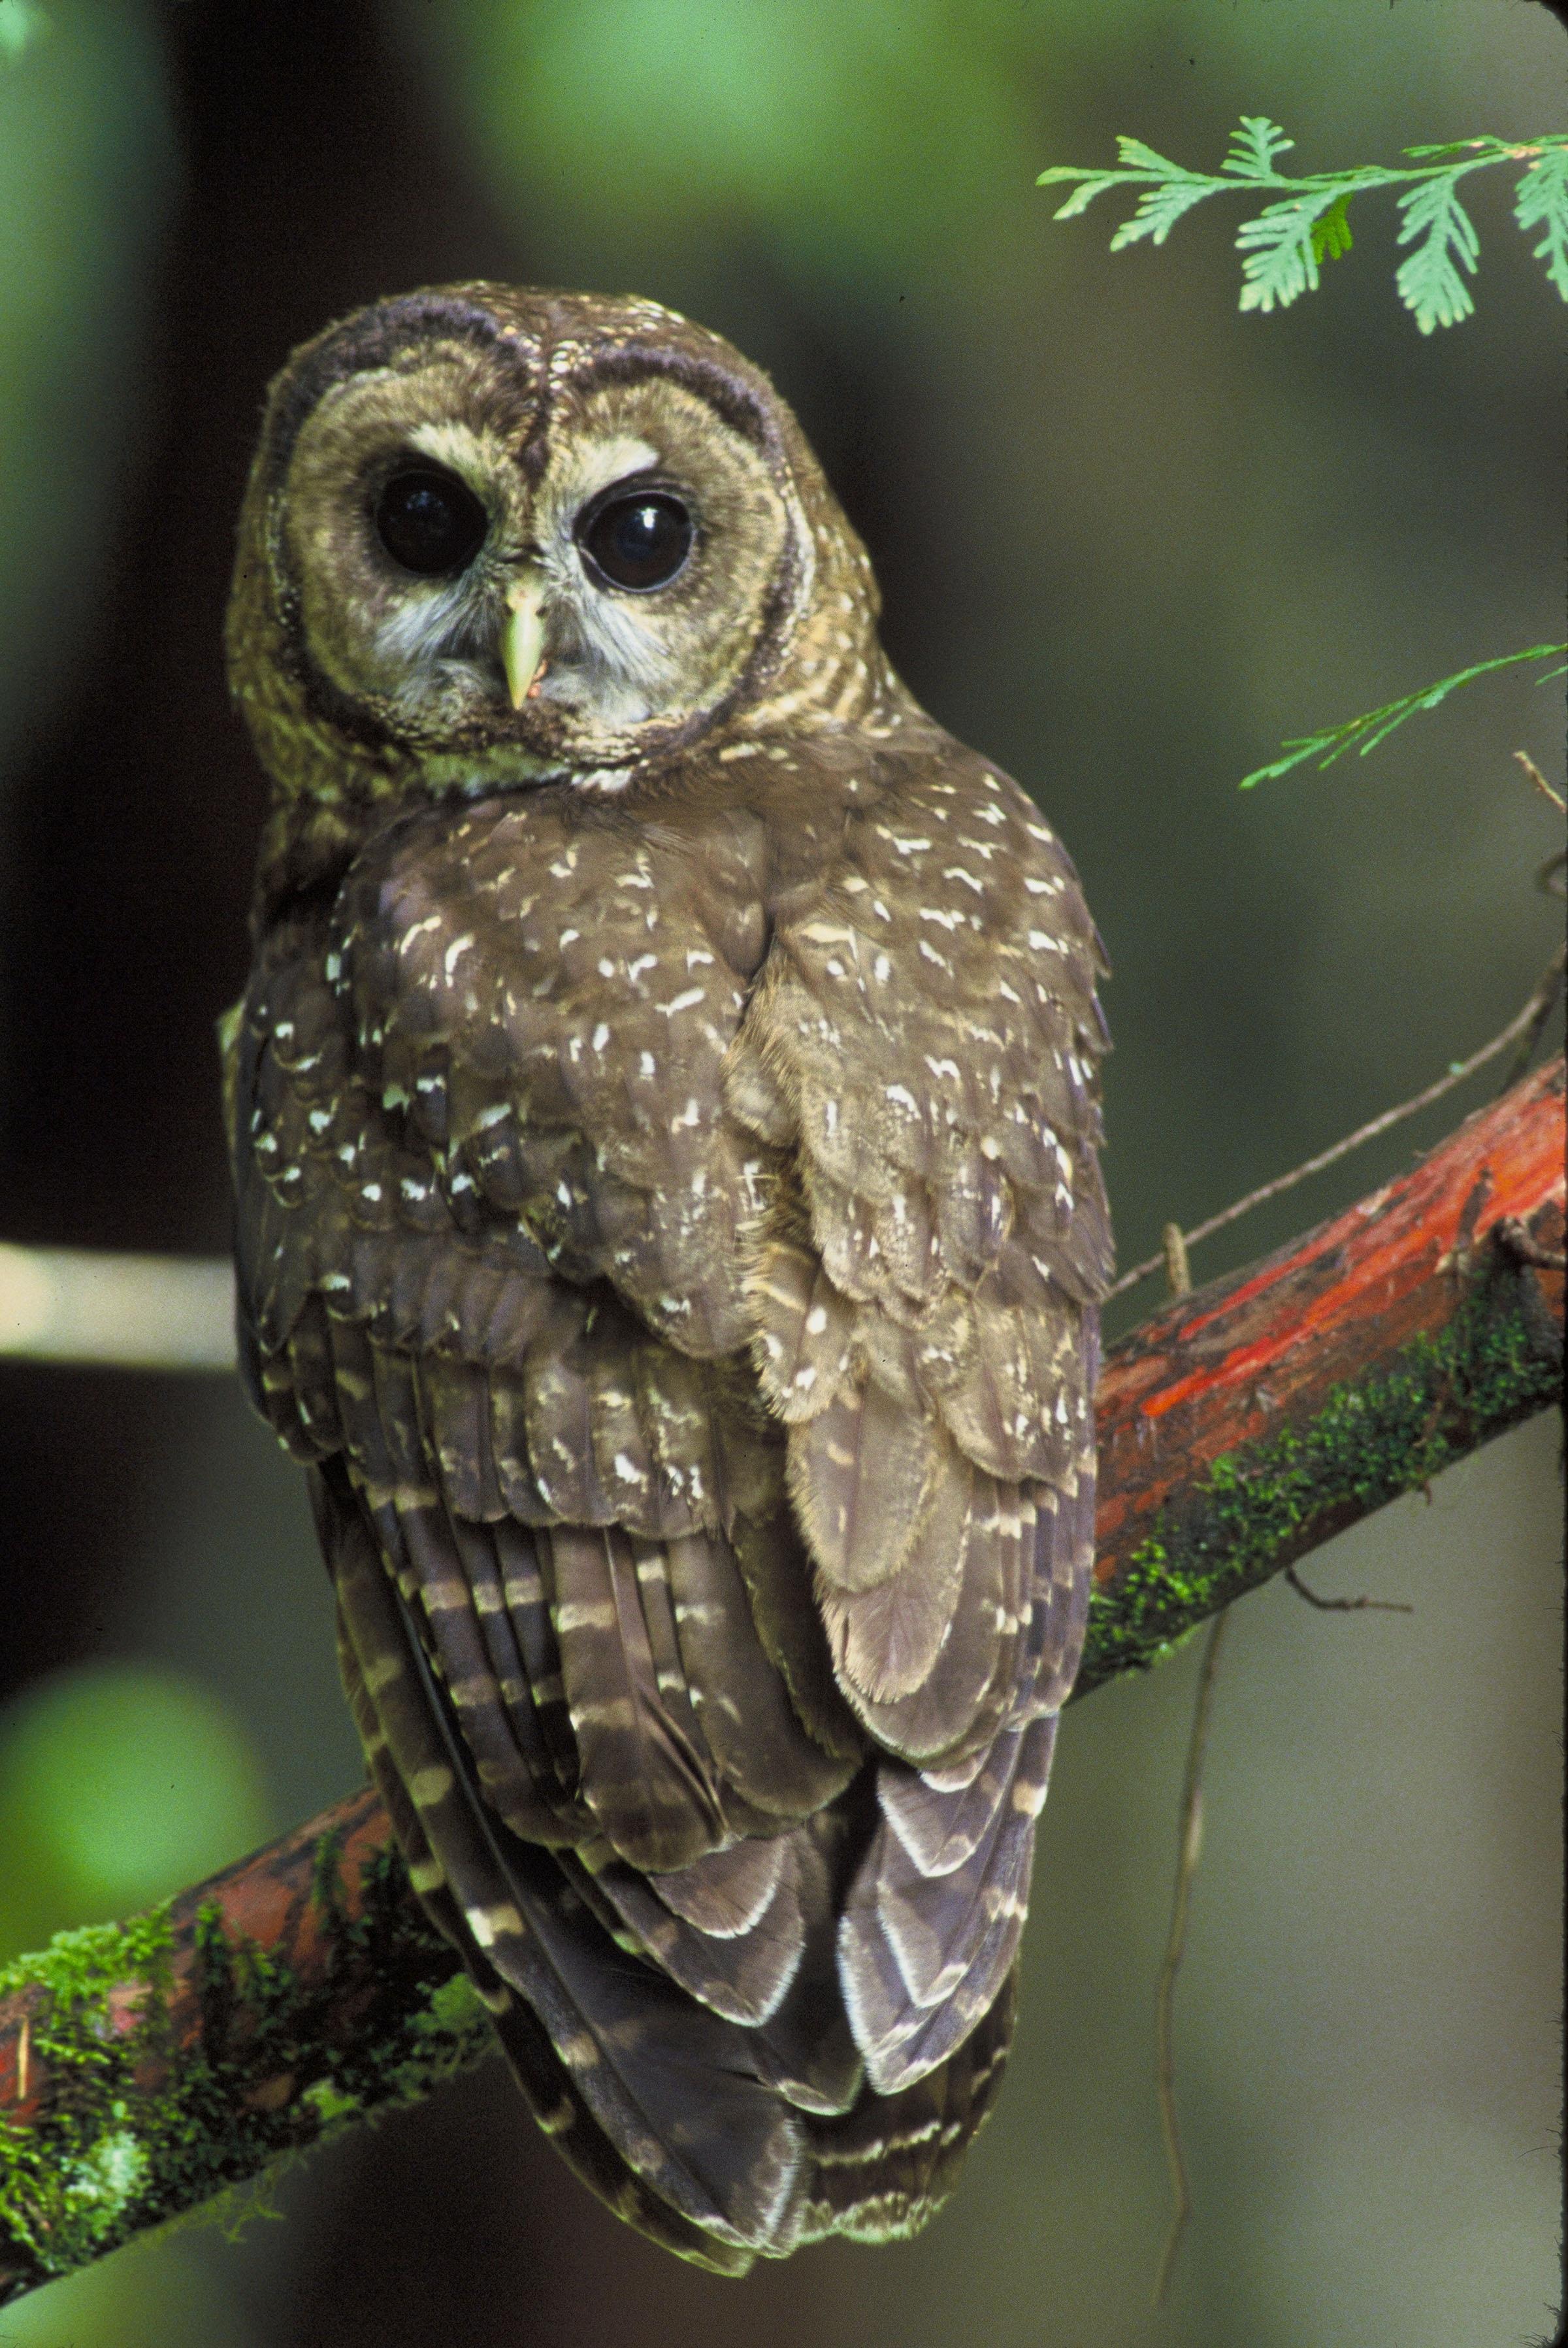 Gambar Sayap Margasatwa Paruh Predator Burung Hantu Fauna Burung Buas Mata Bertulang Belakang Pemburu Nokturnal Bertengger Hantu Kelabu Burung Hantu Berbintik Utara Accipitriformes Burung Hantu Berbintik 2400x3593 771124 Galeri